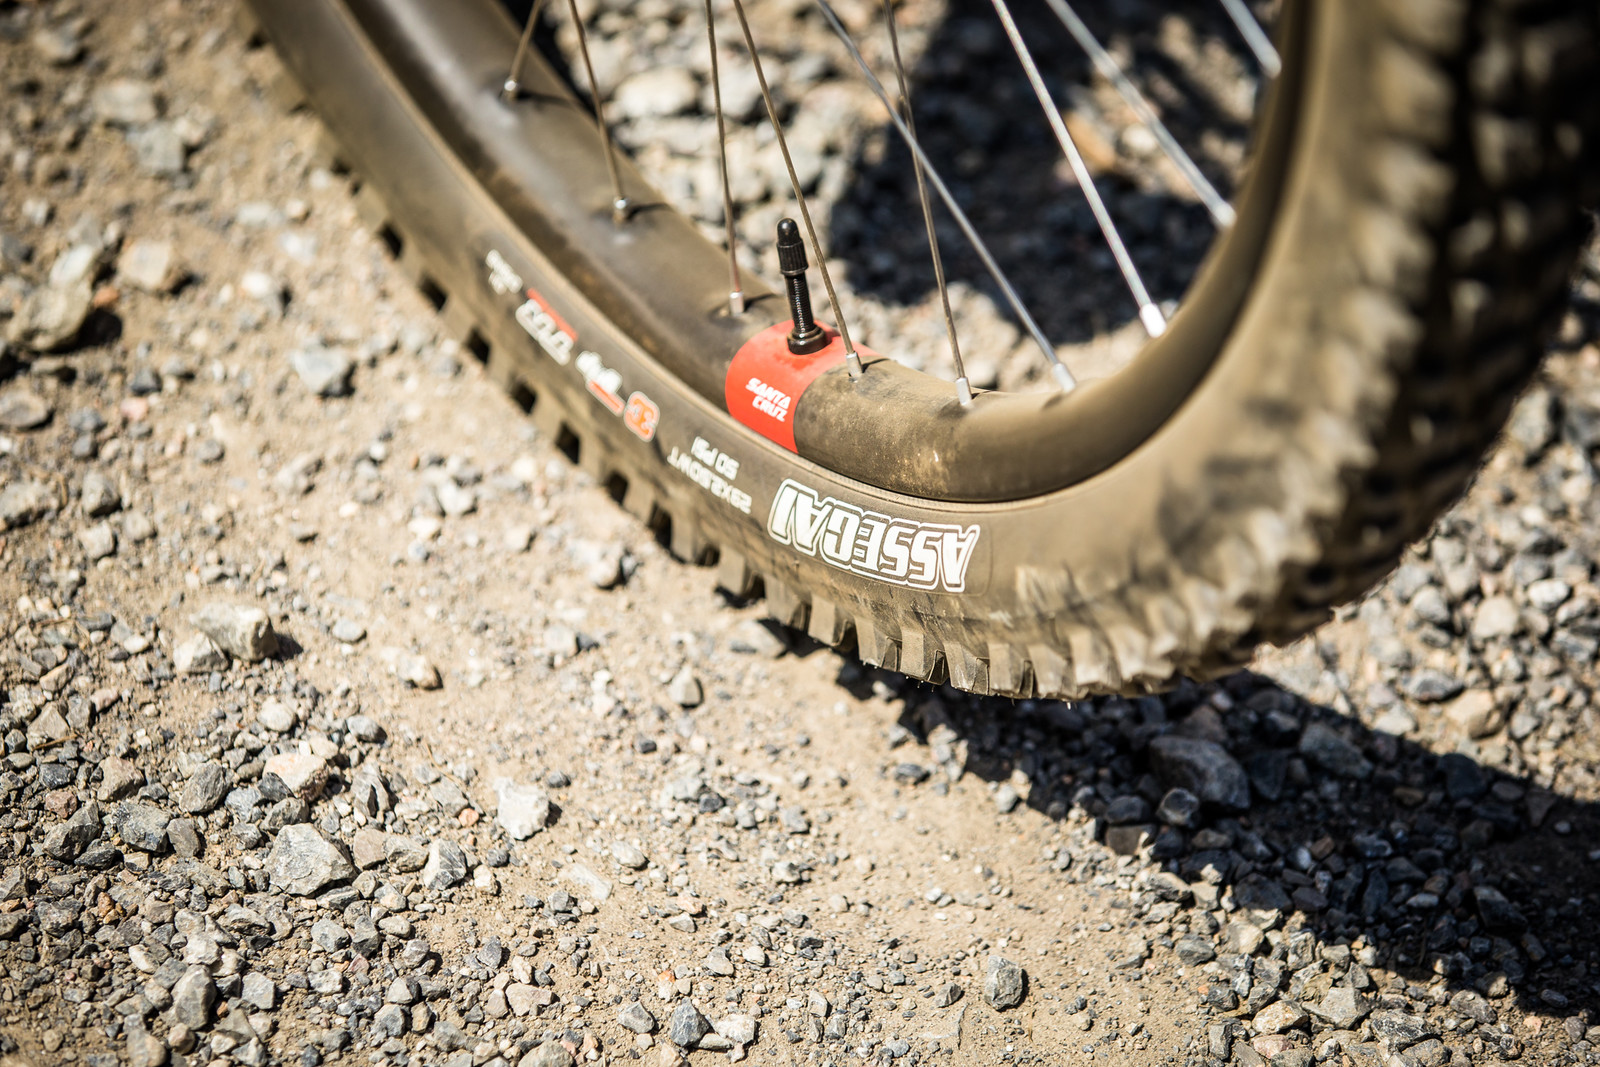 Santa Cruz Carbon Wheels - WINNING BIKE - Loris Vergier's Santa Cruz V10cc 29 - Mountain Biking Pictures - Vital MTB